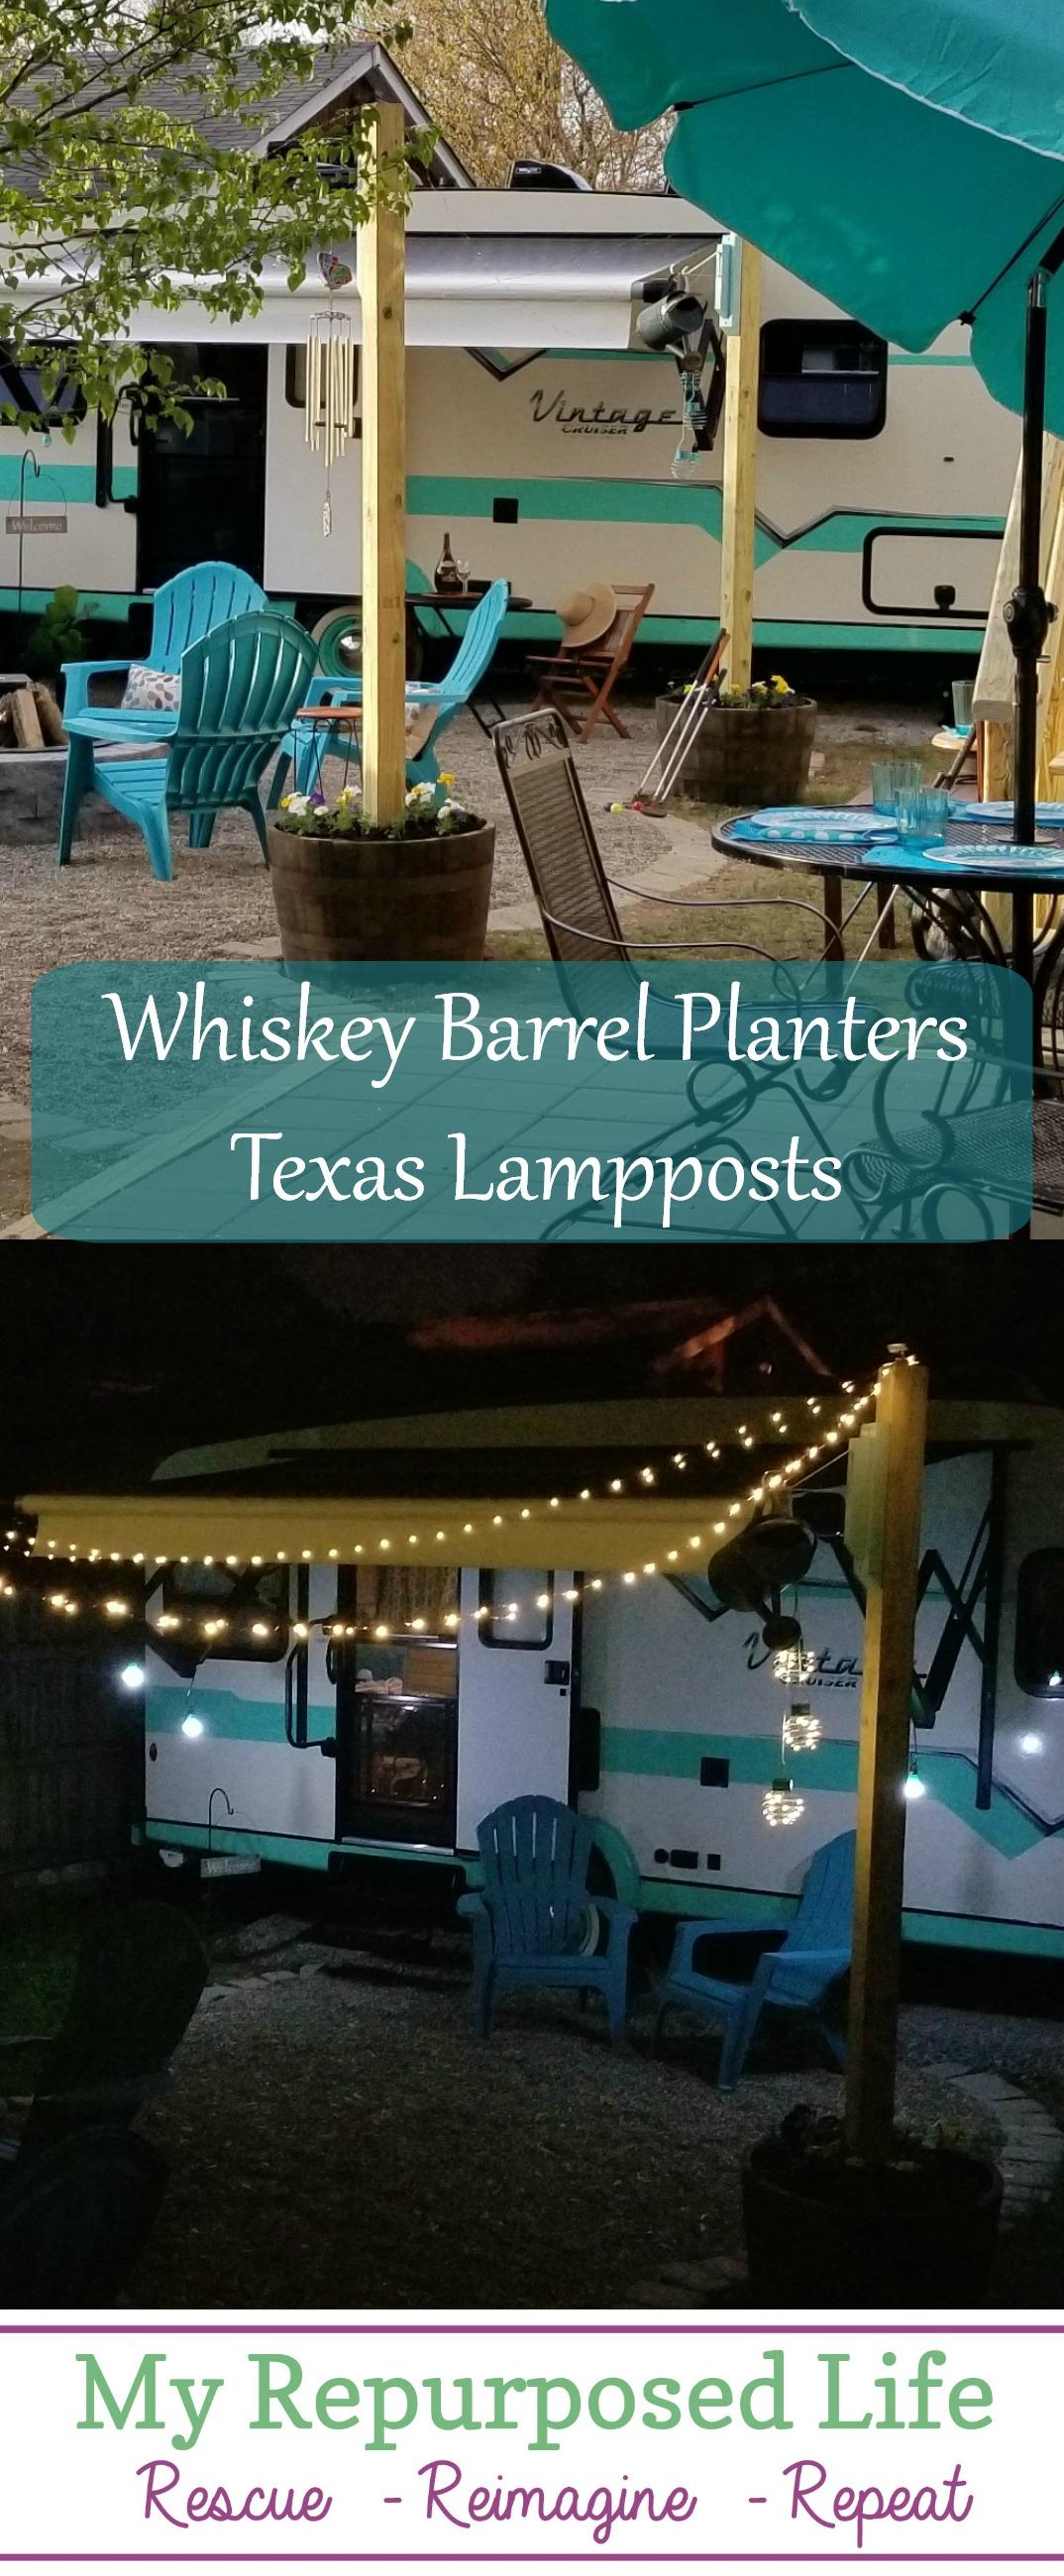 Whiskey Barrel Light Post  Tiny Solar Lights Tips for securing 4x4's in a whiskey barrel, with the cutest solar lights! No electricity needed! #texaslamppost #myrepurposedlife #outdoor #living #lighting #solar #camper #backyard via @repurposedlife